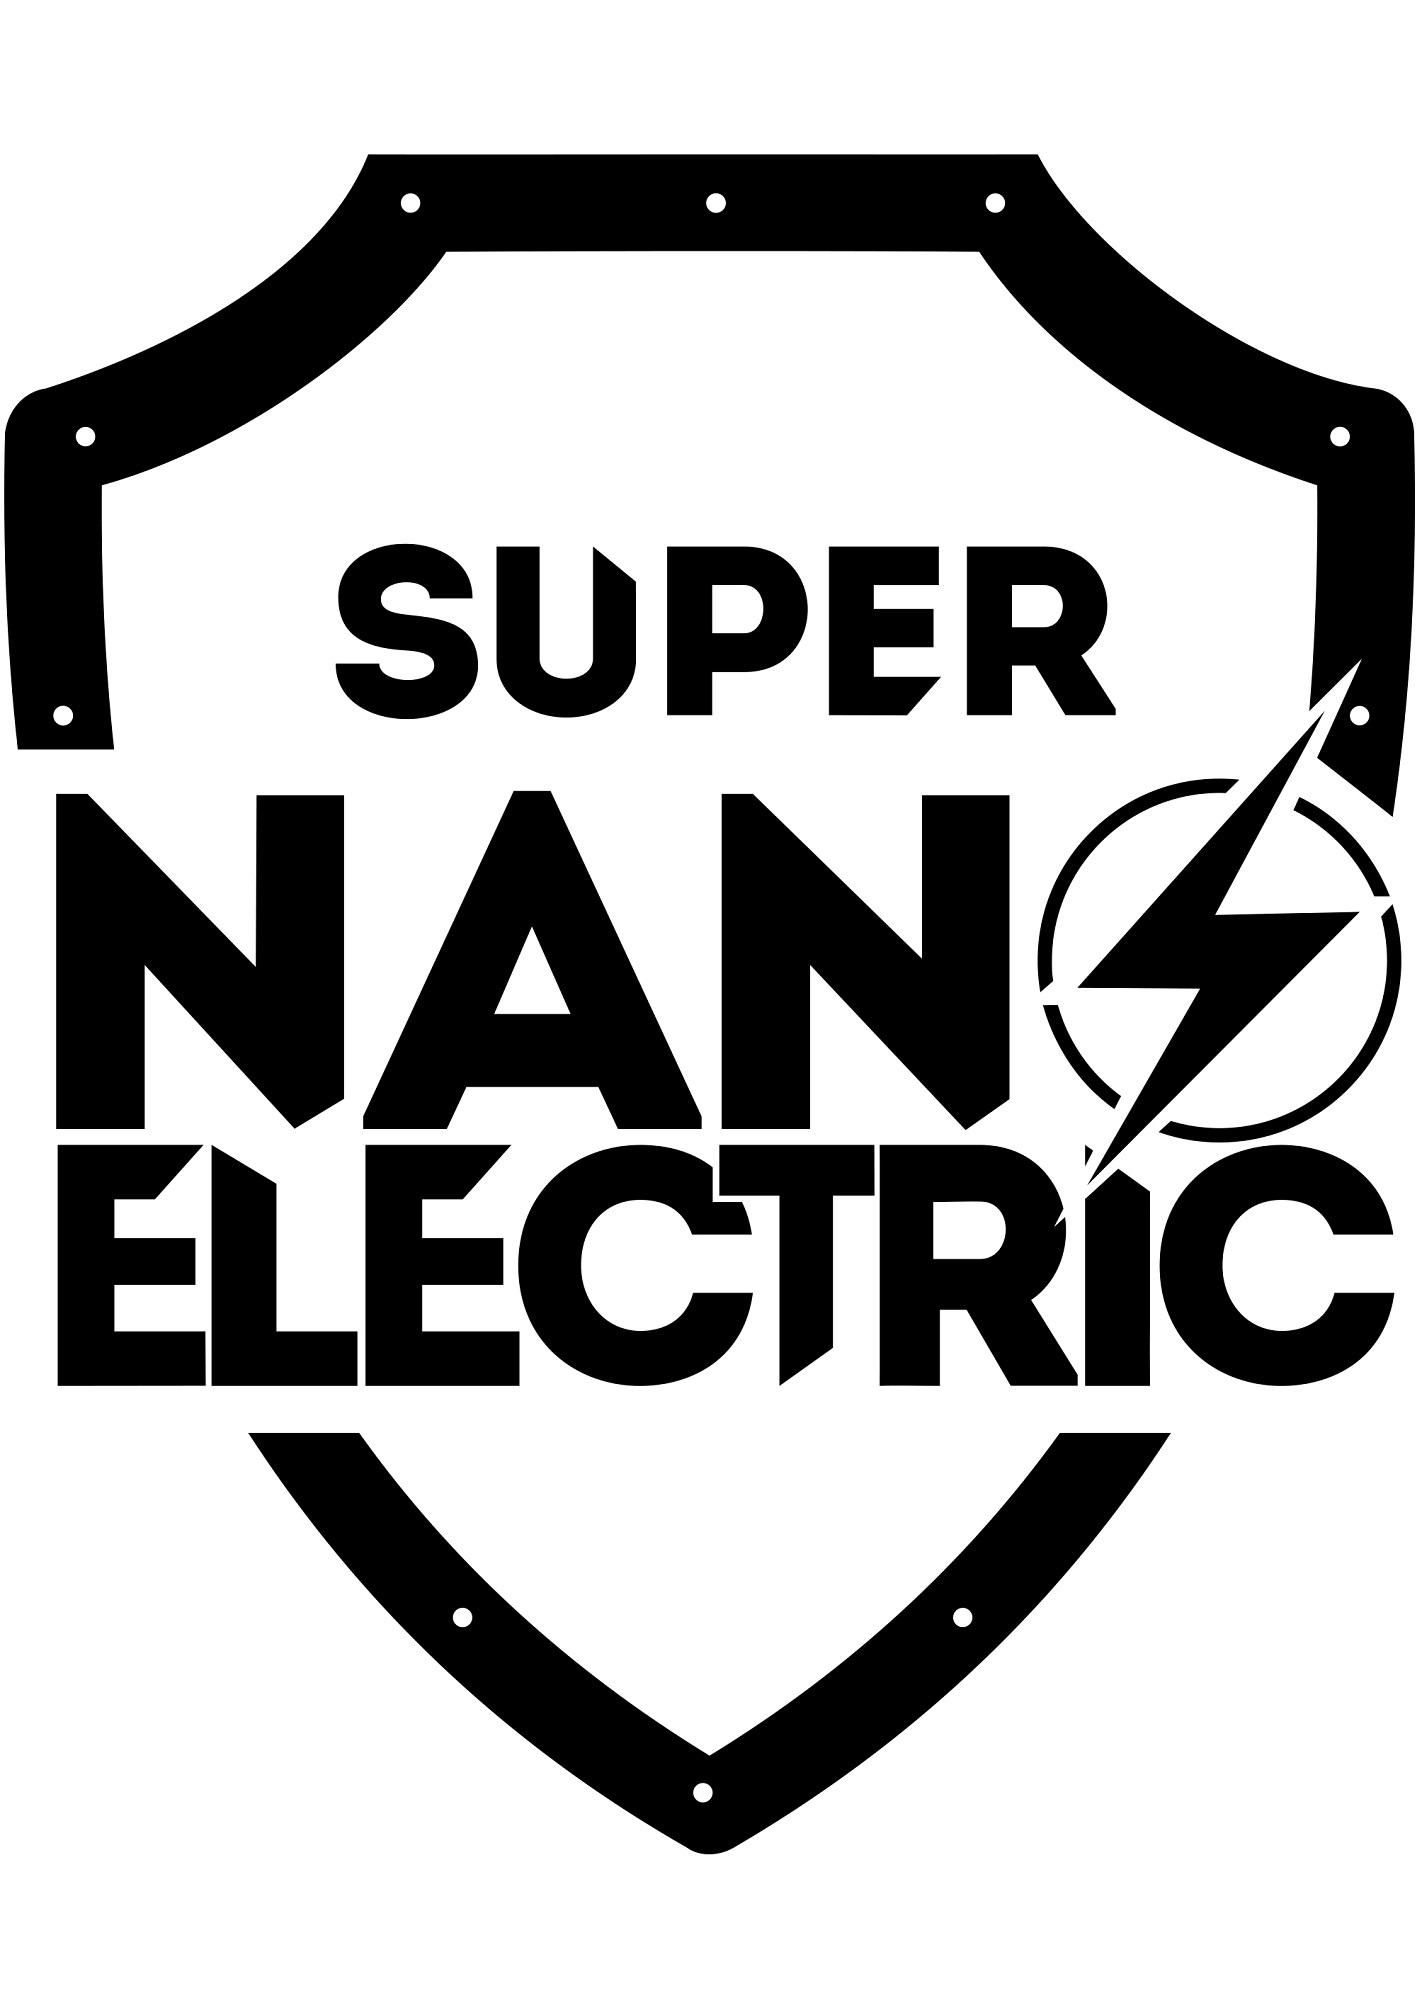 SUPER NANO ELECTRIC